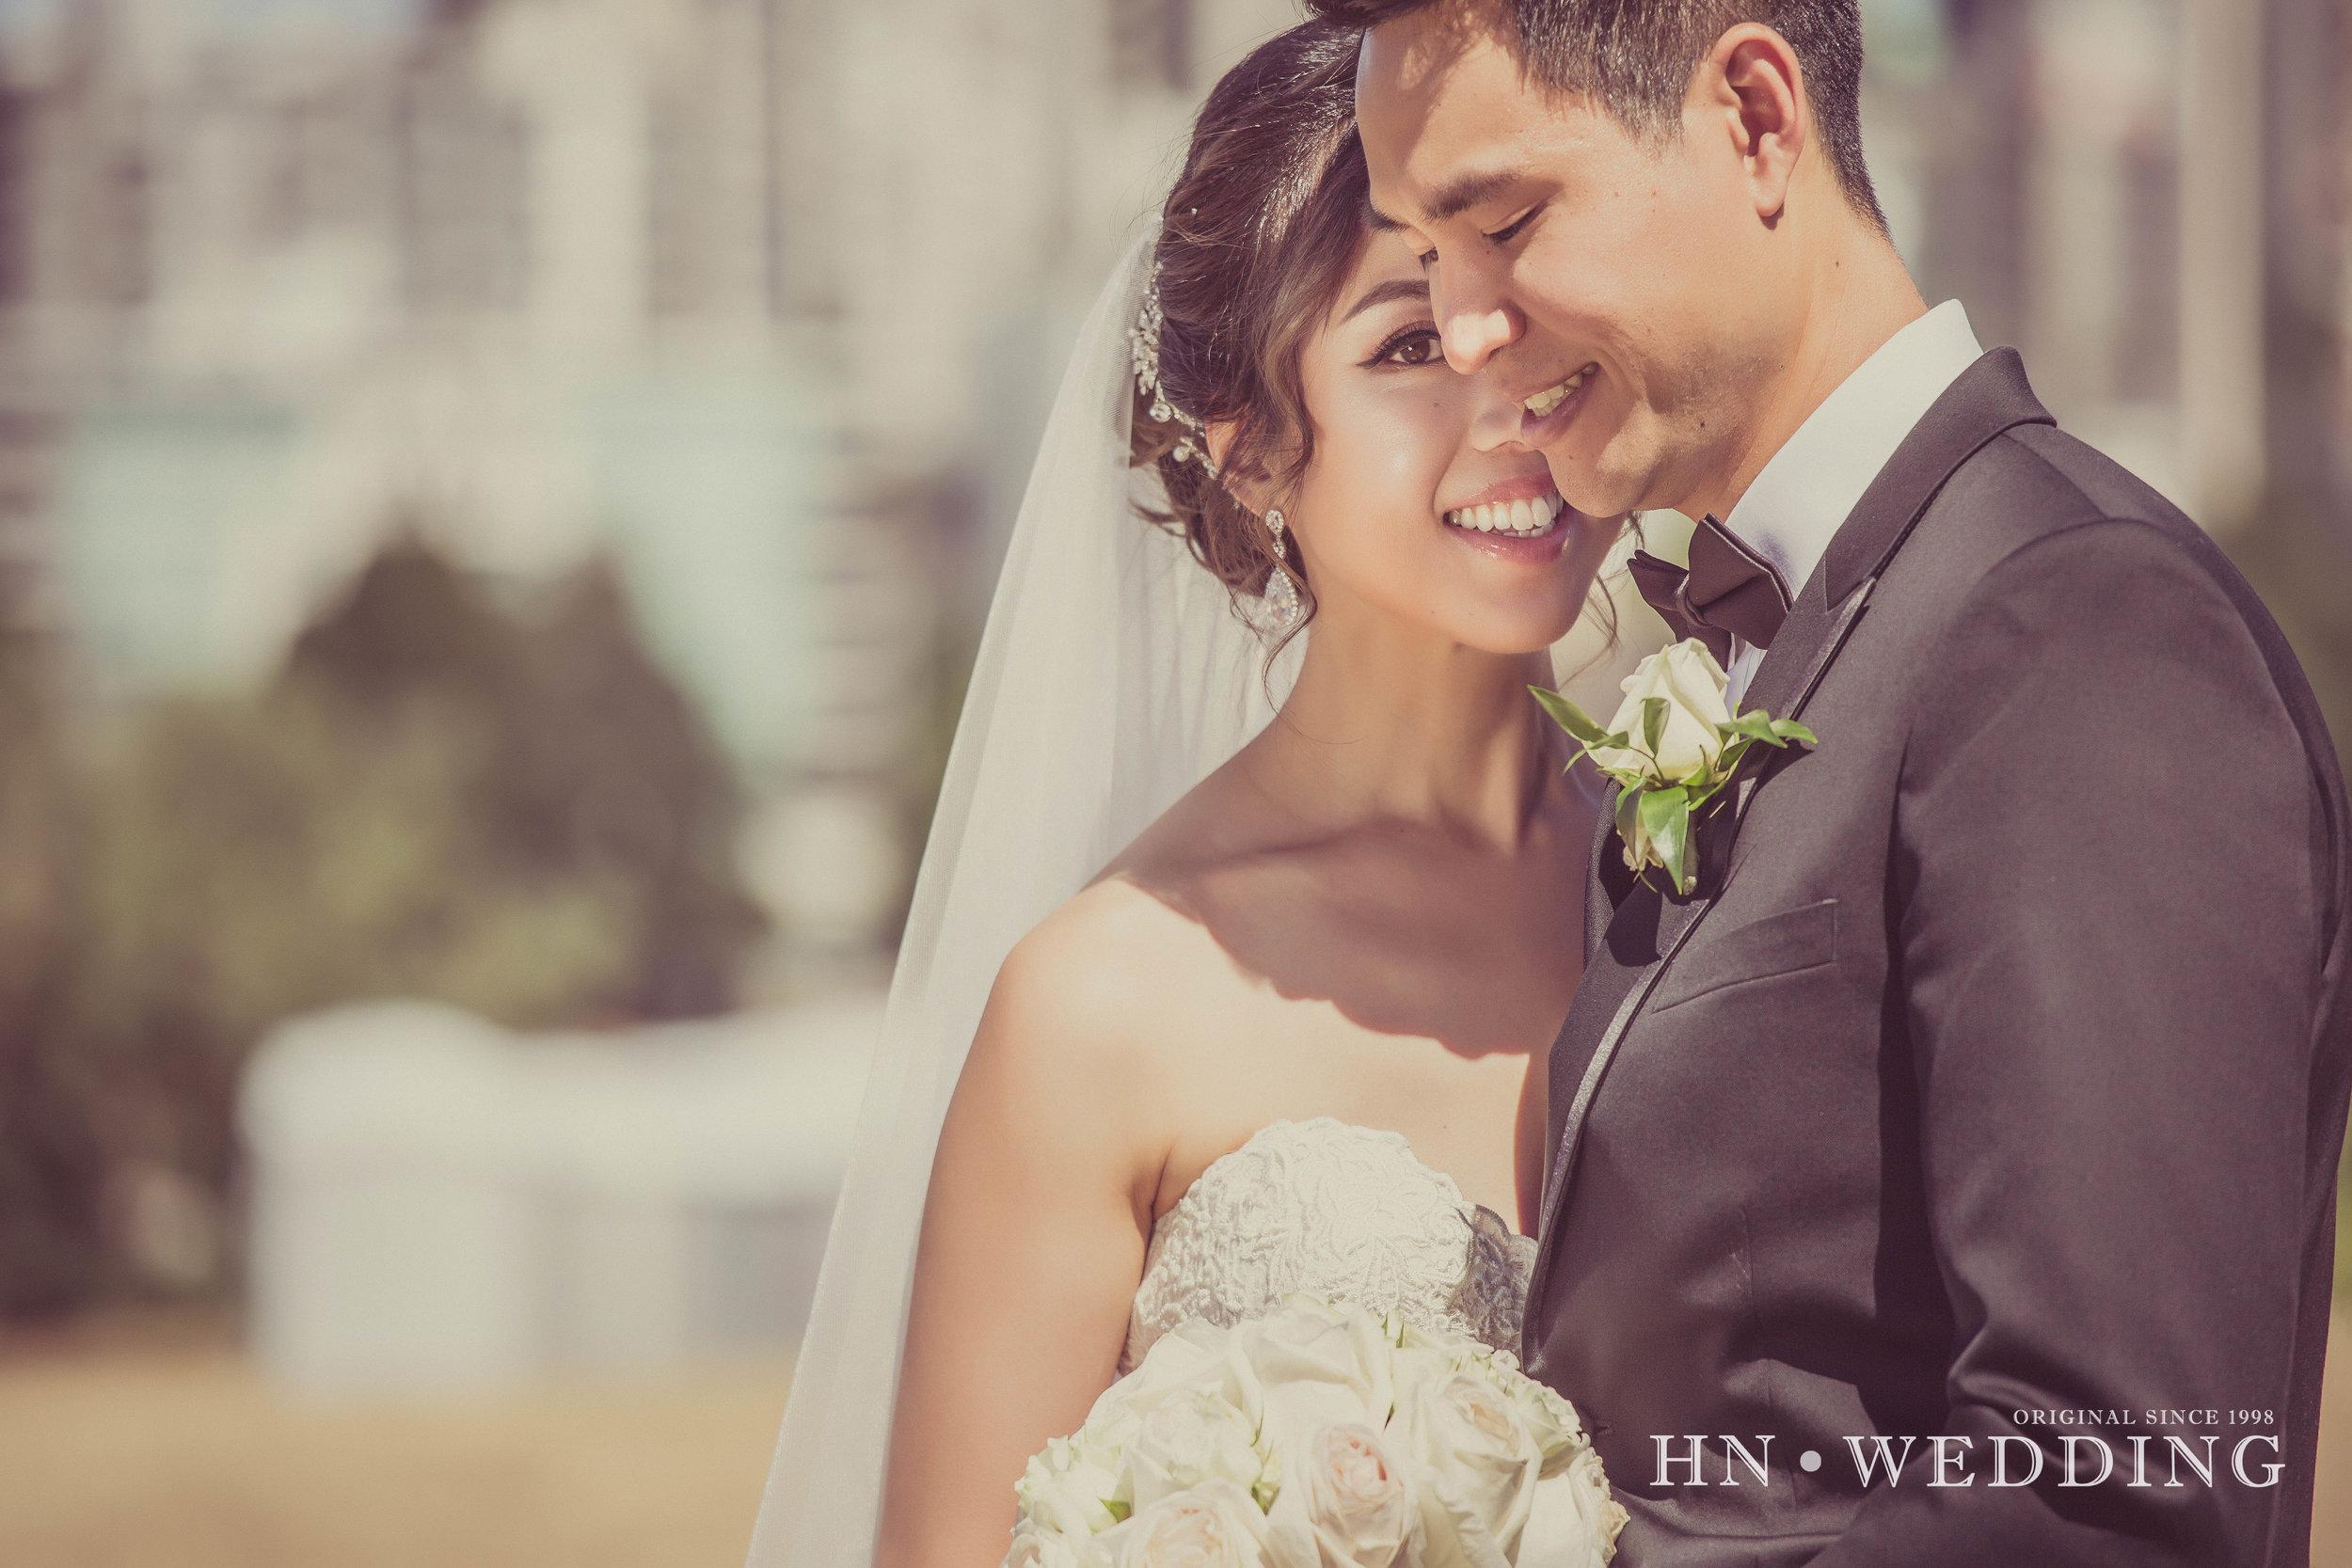 HNwedding-weddingday-20170729--60.jpg